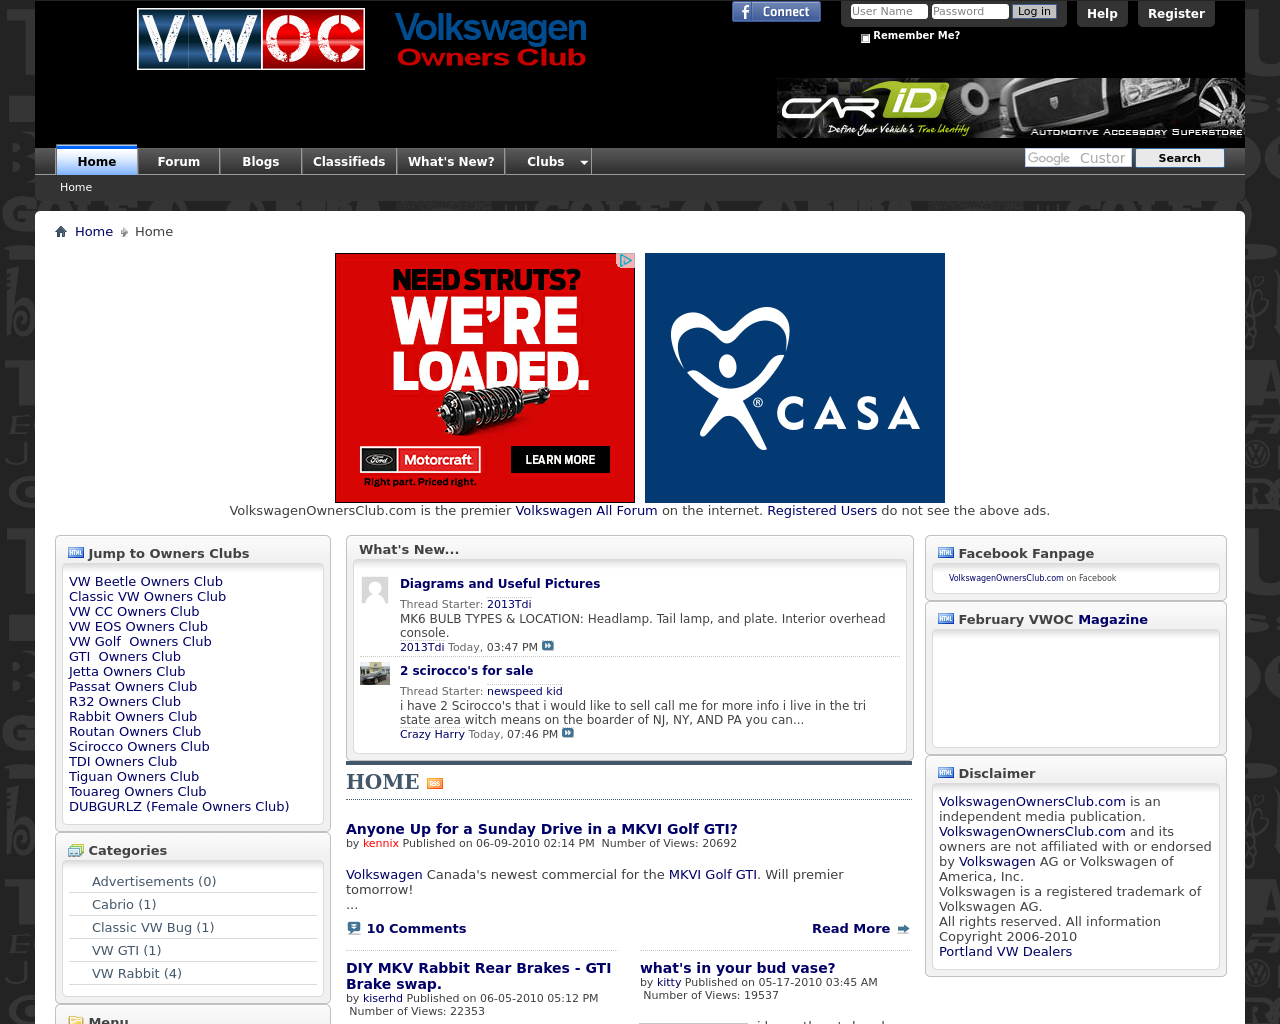 Volkswagen-Owners-Club-Advertising-Reviews-Pricing